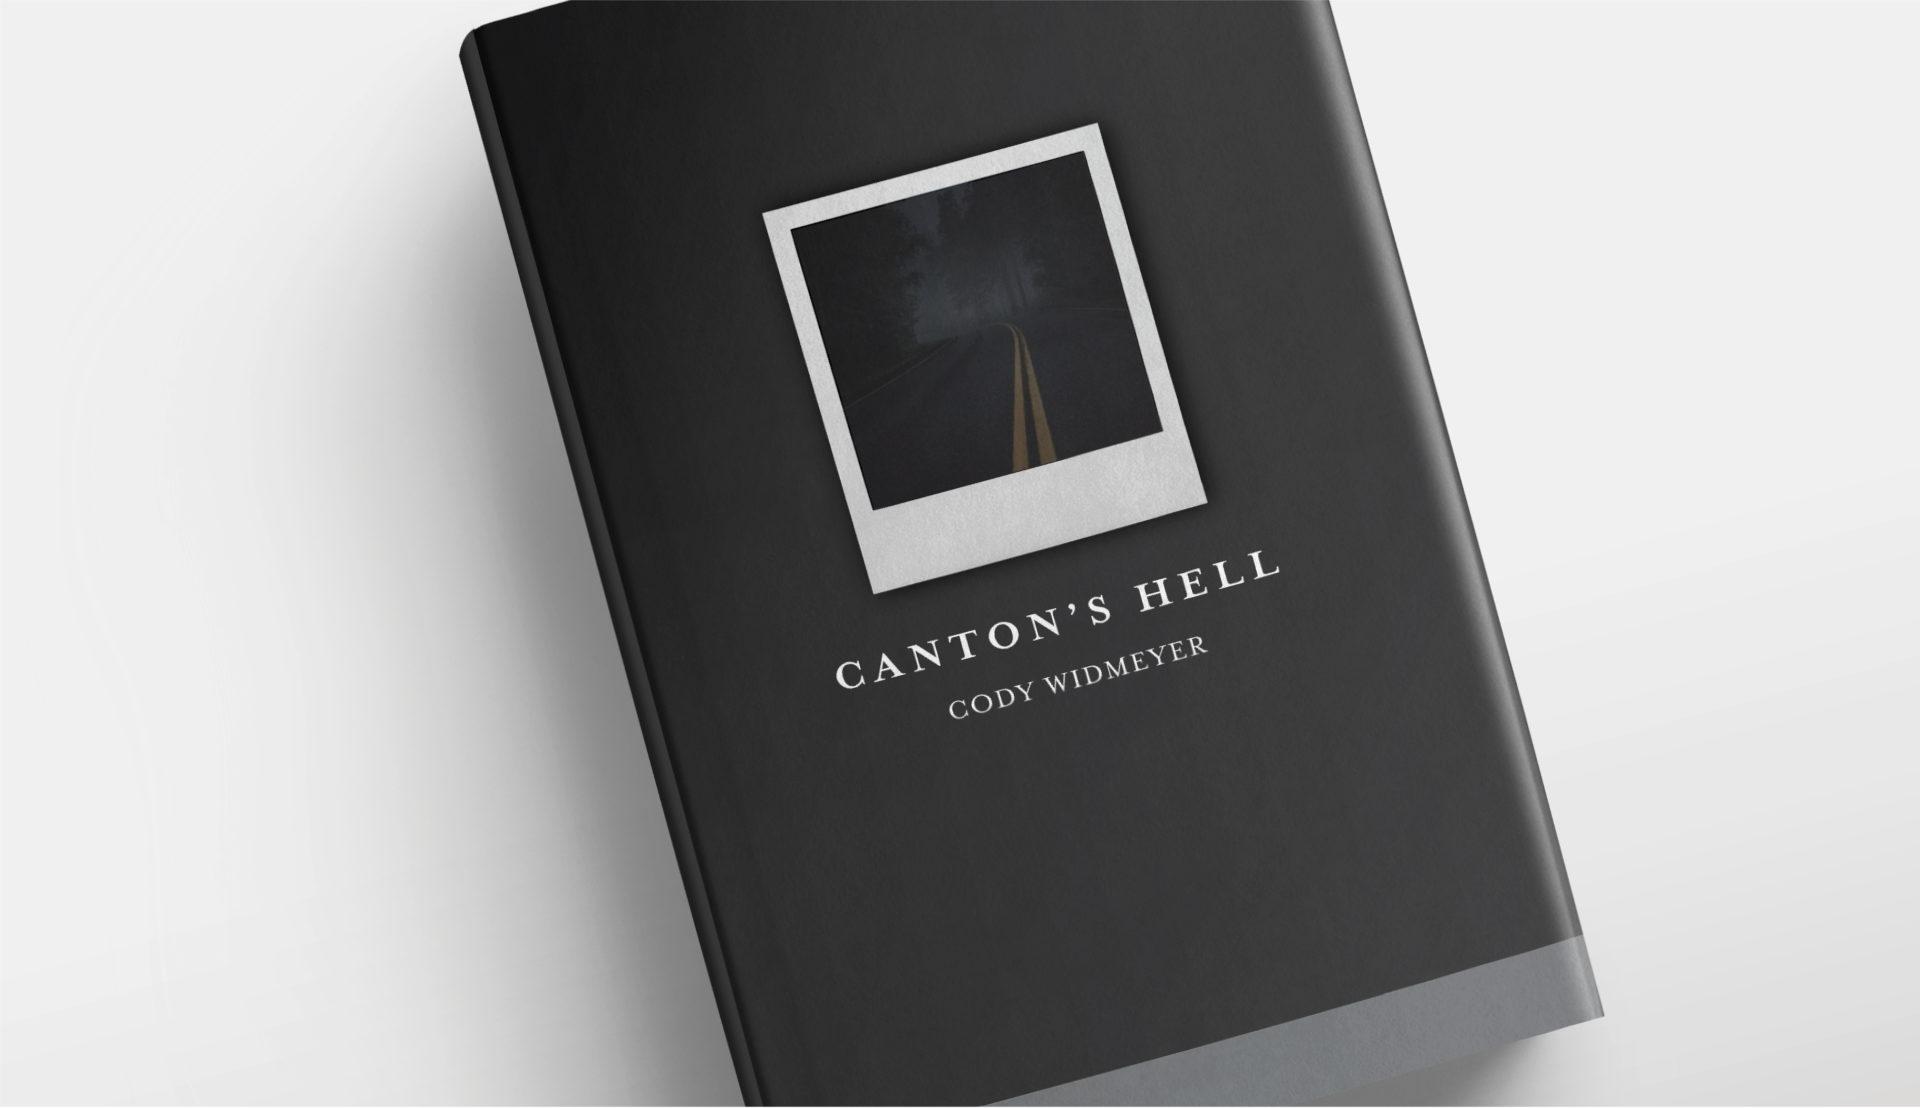 Canton's Hell - Branding   The Underground Design Studio